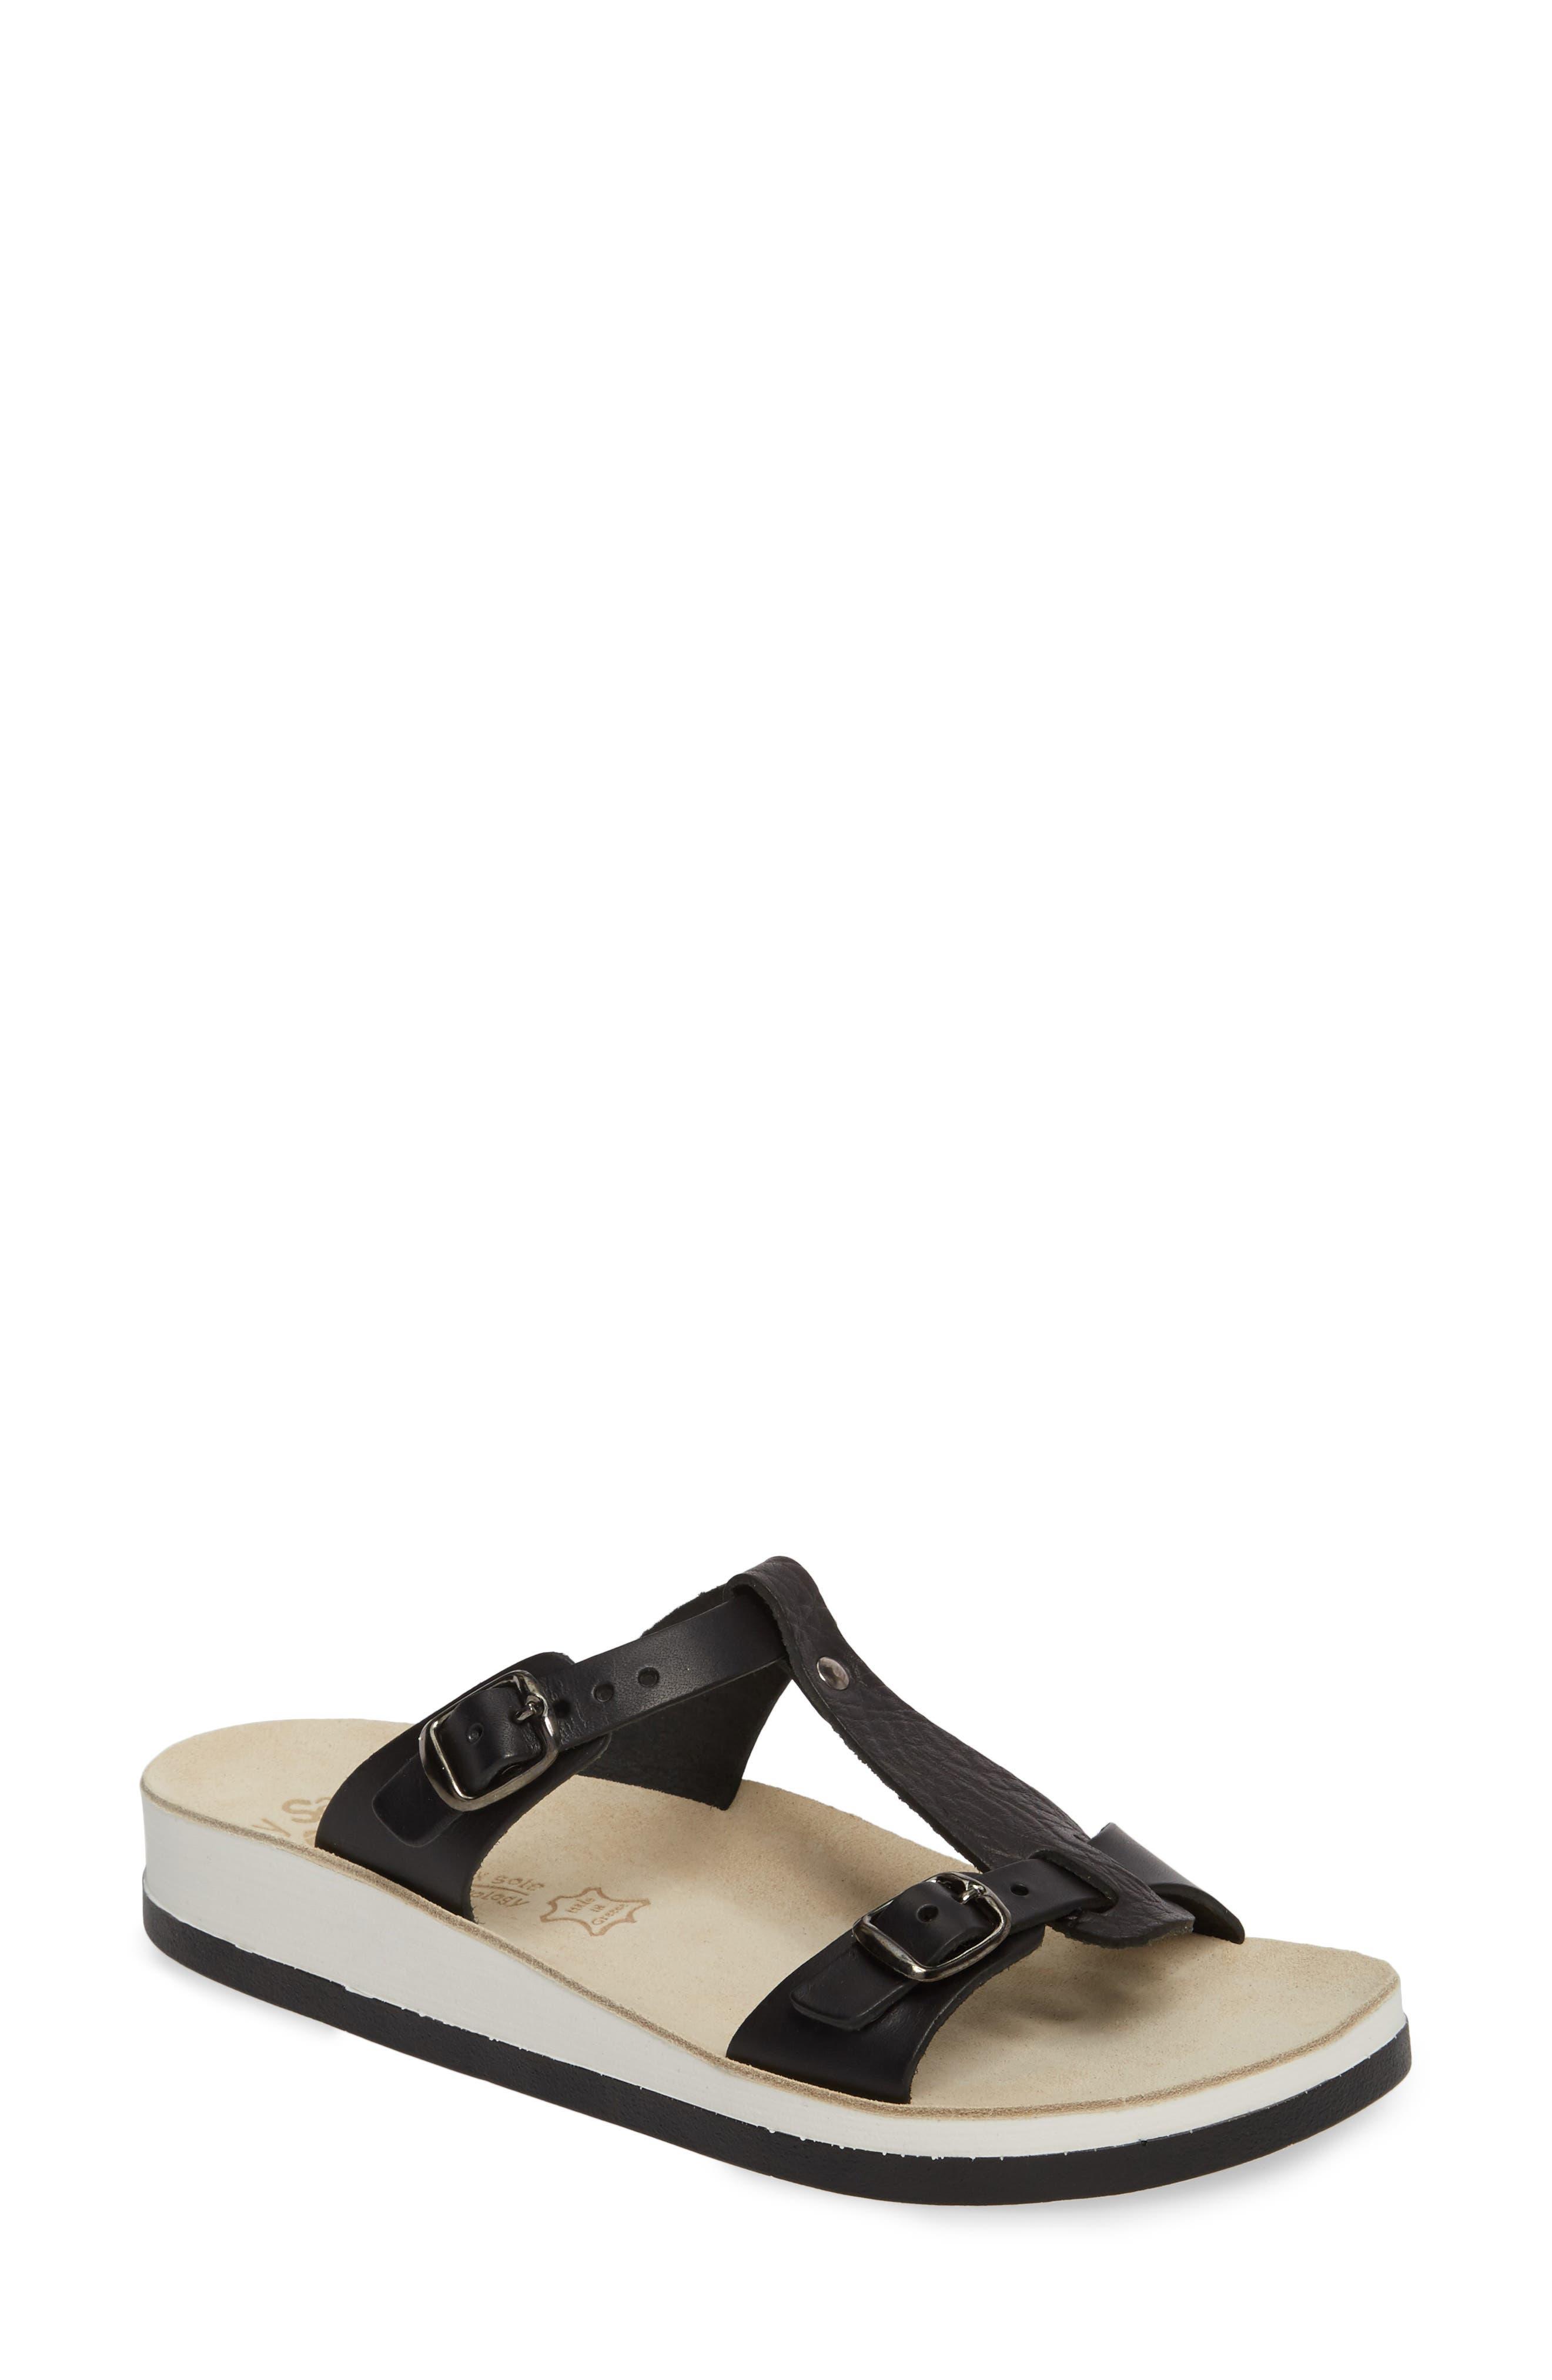 Jessamine T-Strap Sandal,                             Main thumbnail 1, color,                             Black Volcano Leather